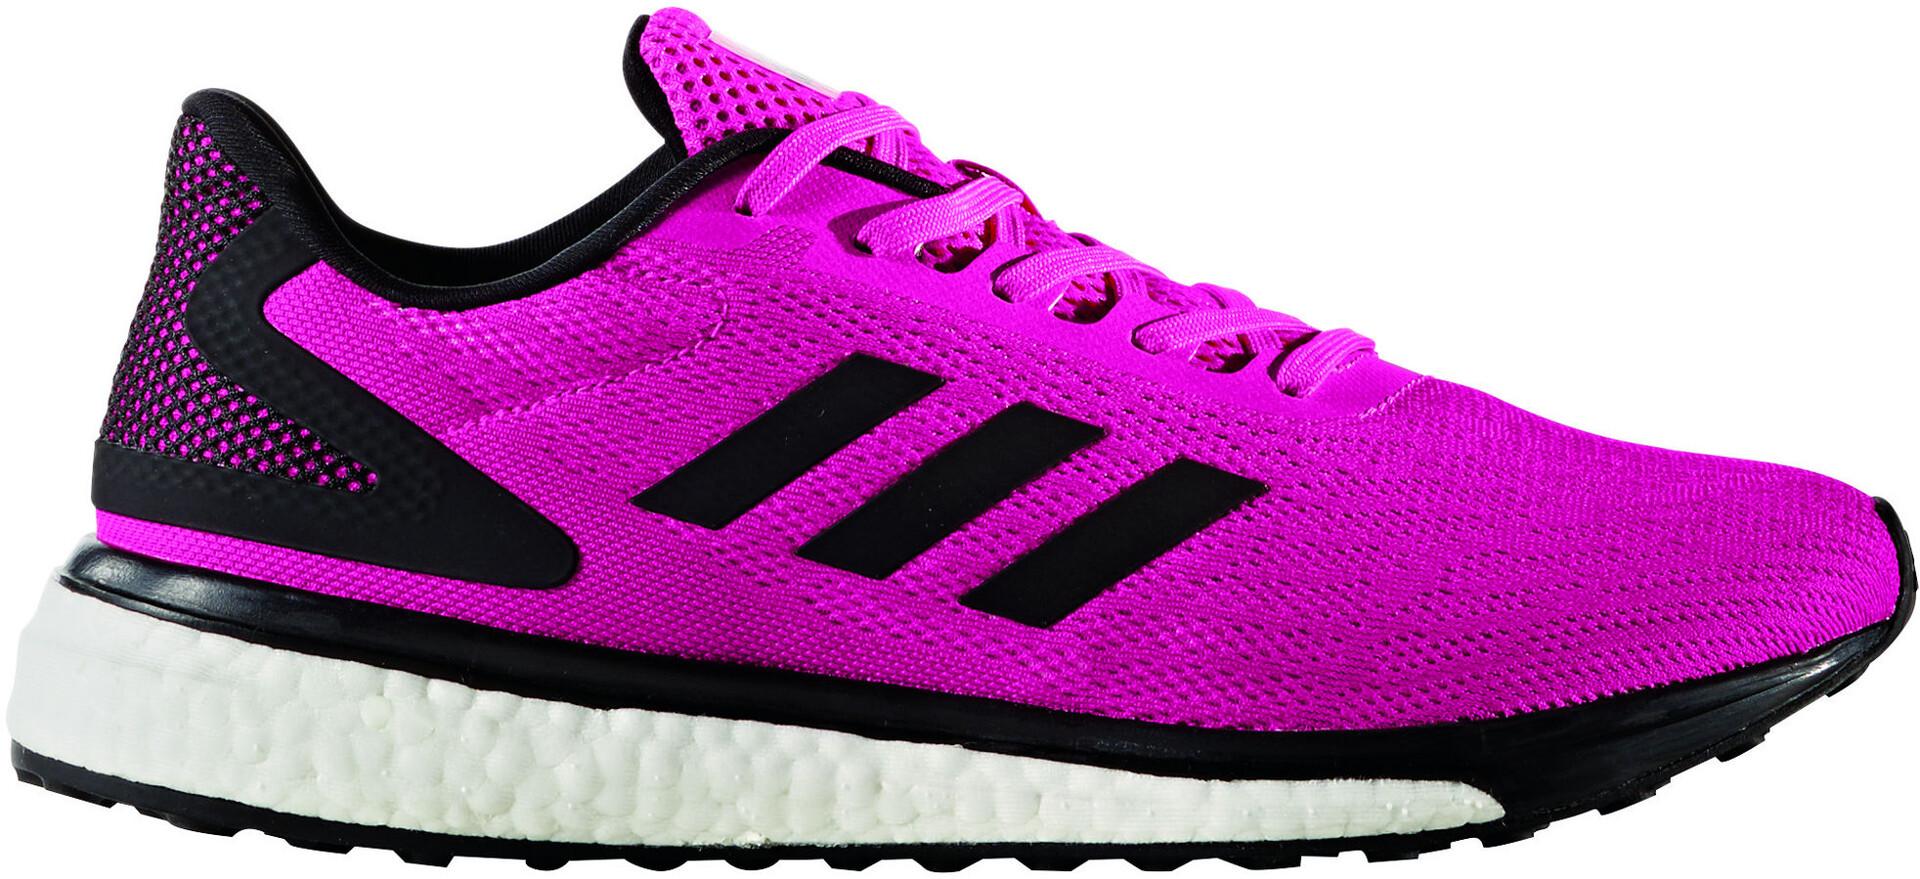 scarpe adidas response donna